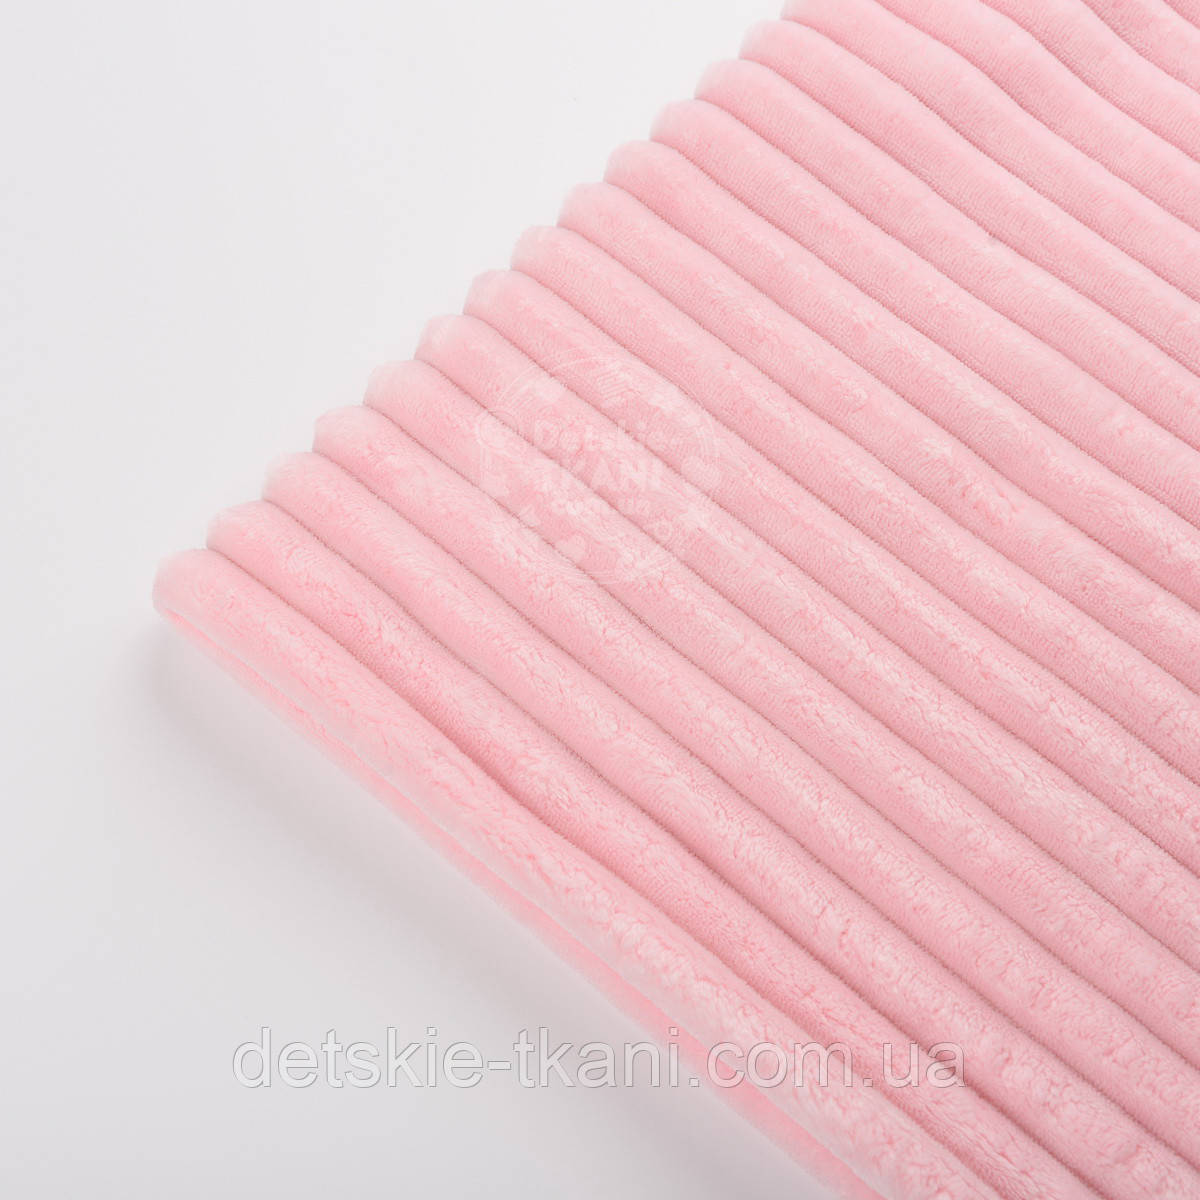 "Отрез плюша в полоску ""Stripes"" размером 100*80 см светло-розового цвета"